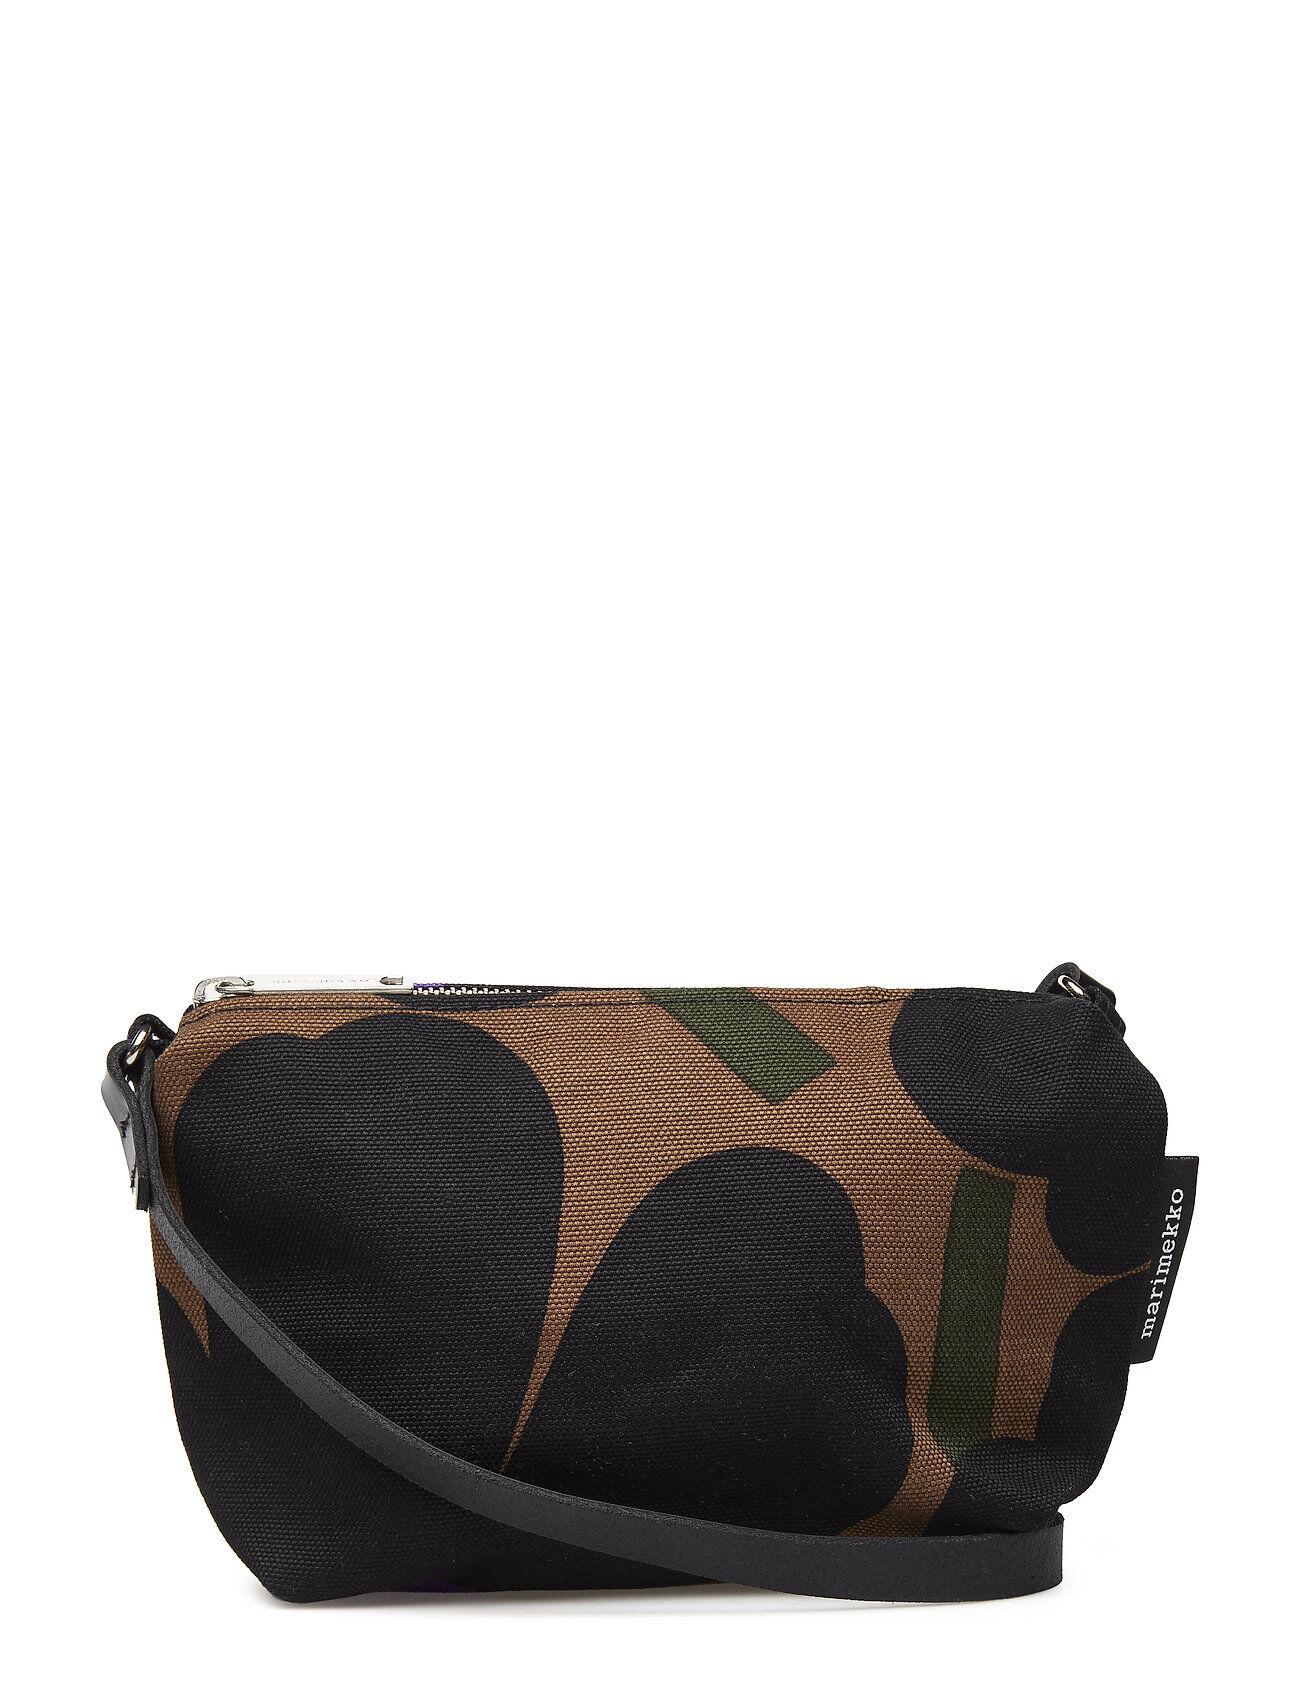 Marimekko Heli Pieni Unikko Shoulder-Bag